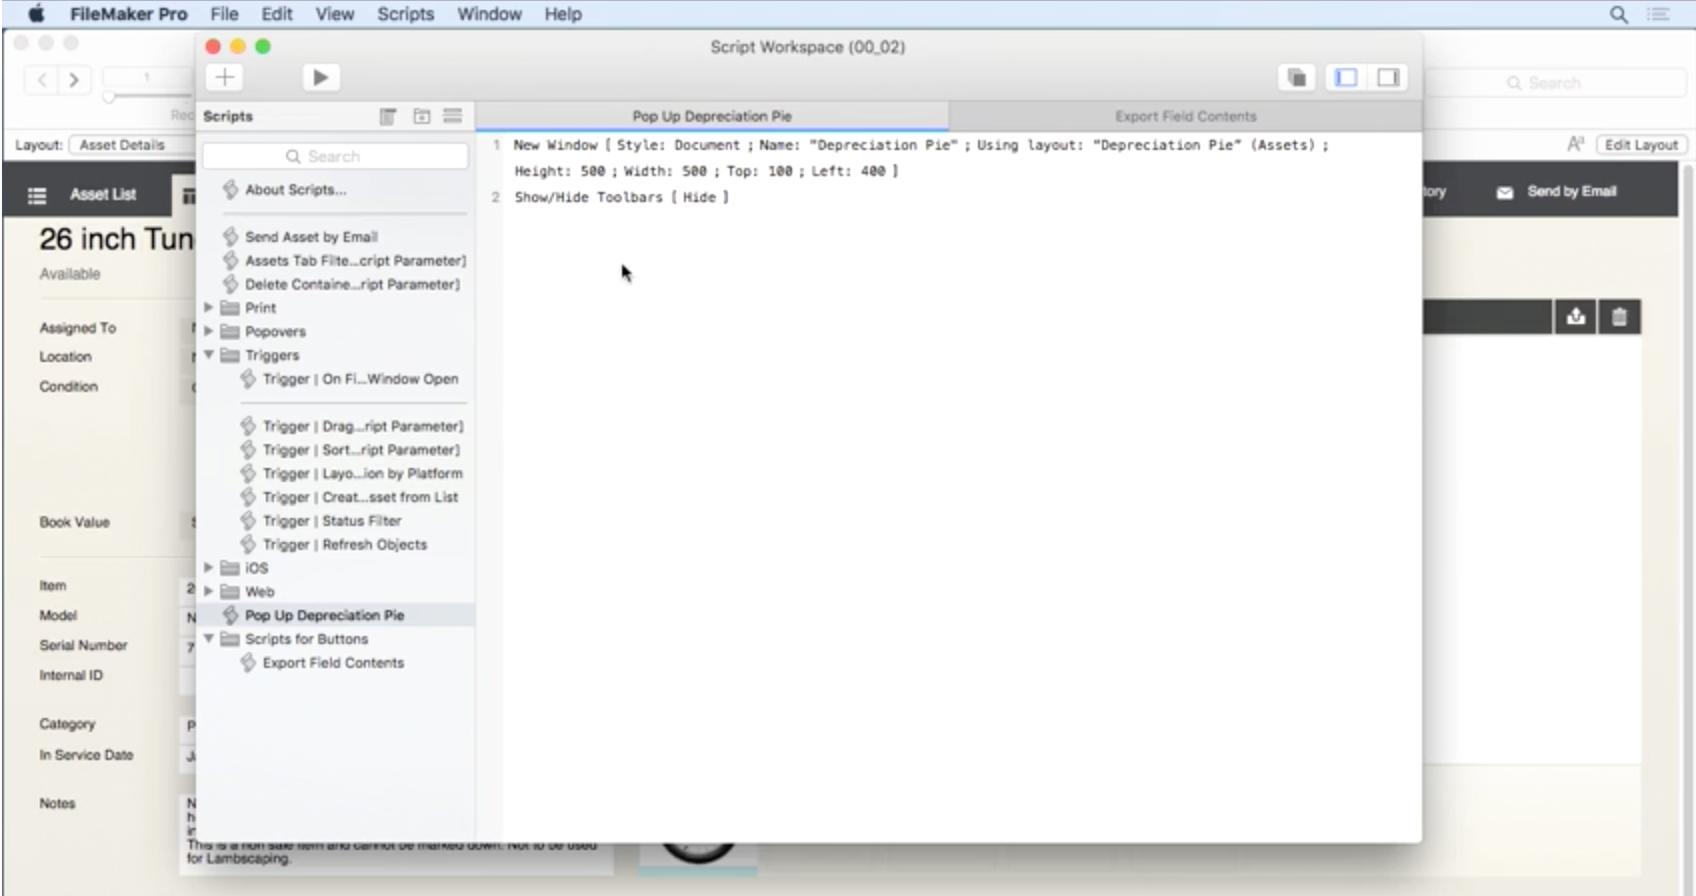 Script workspace